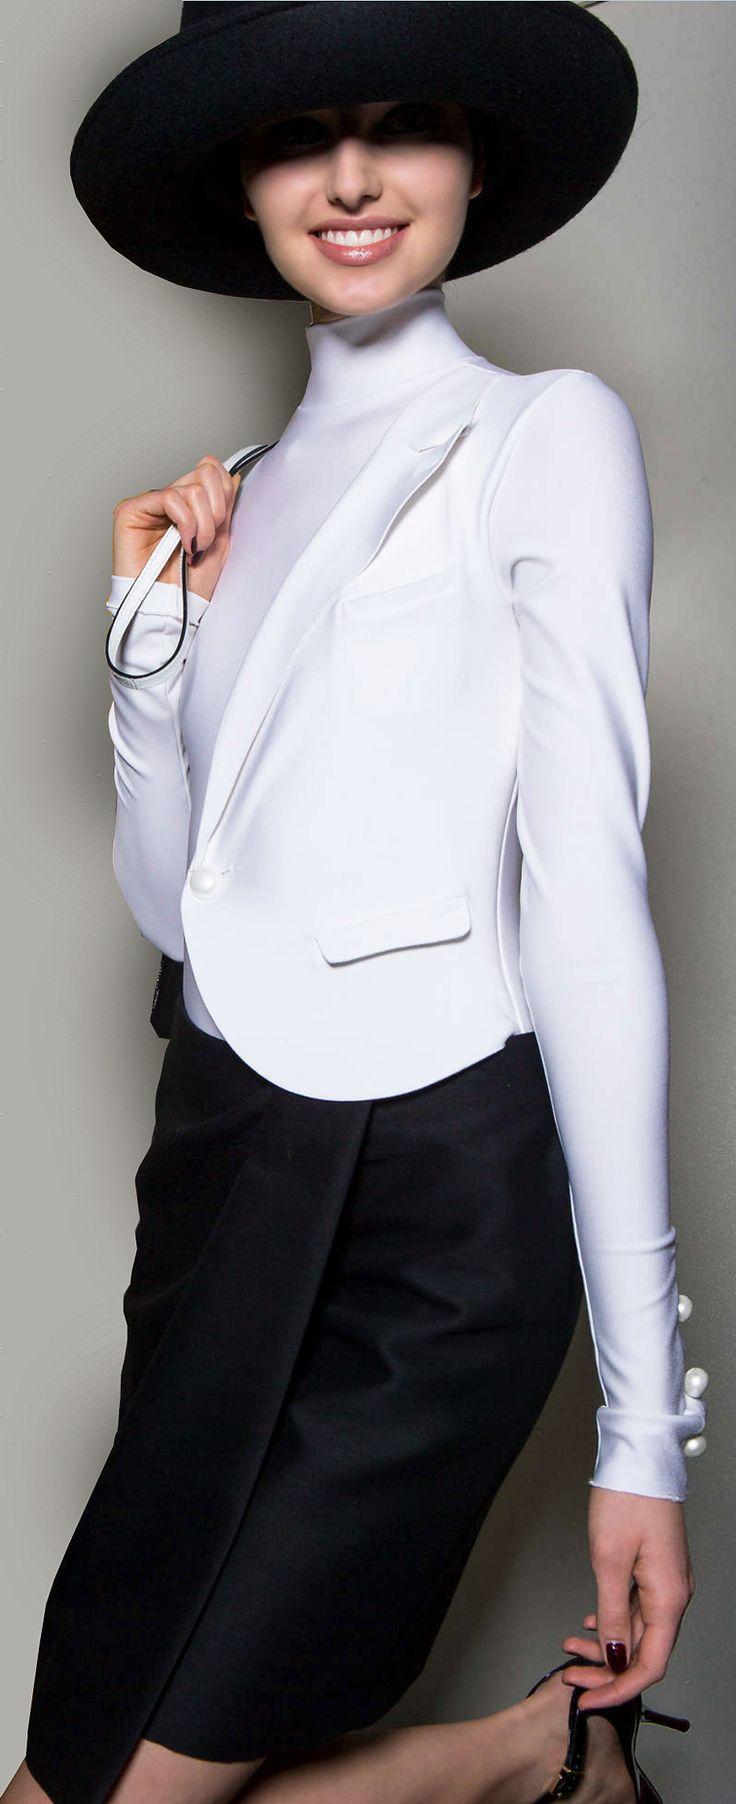 Classy Armani white blazer and black skirt